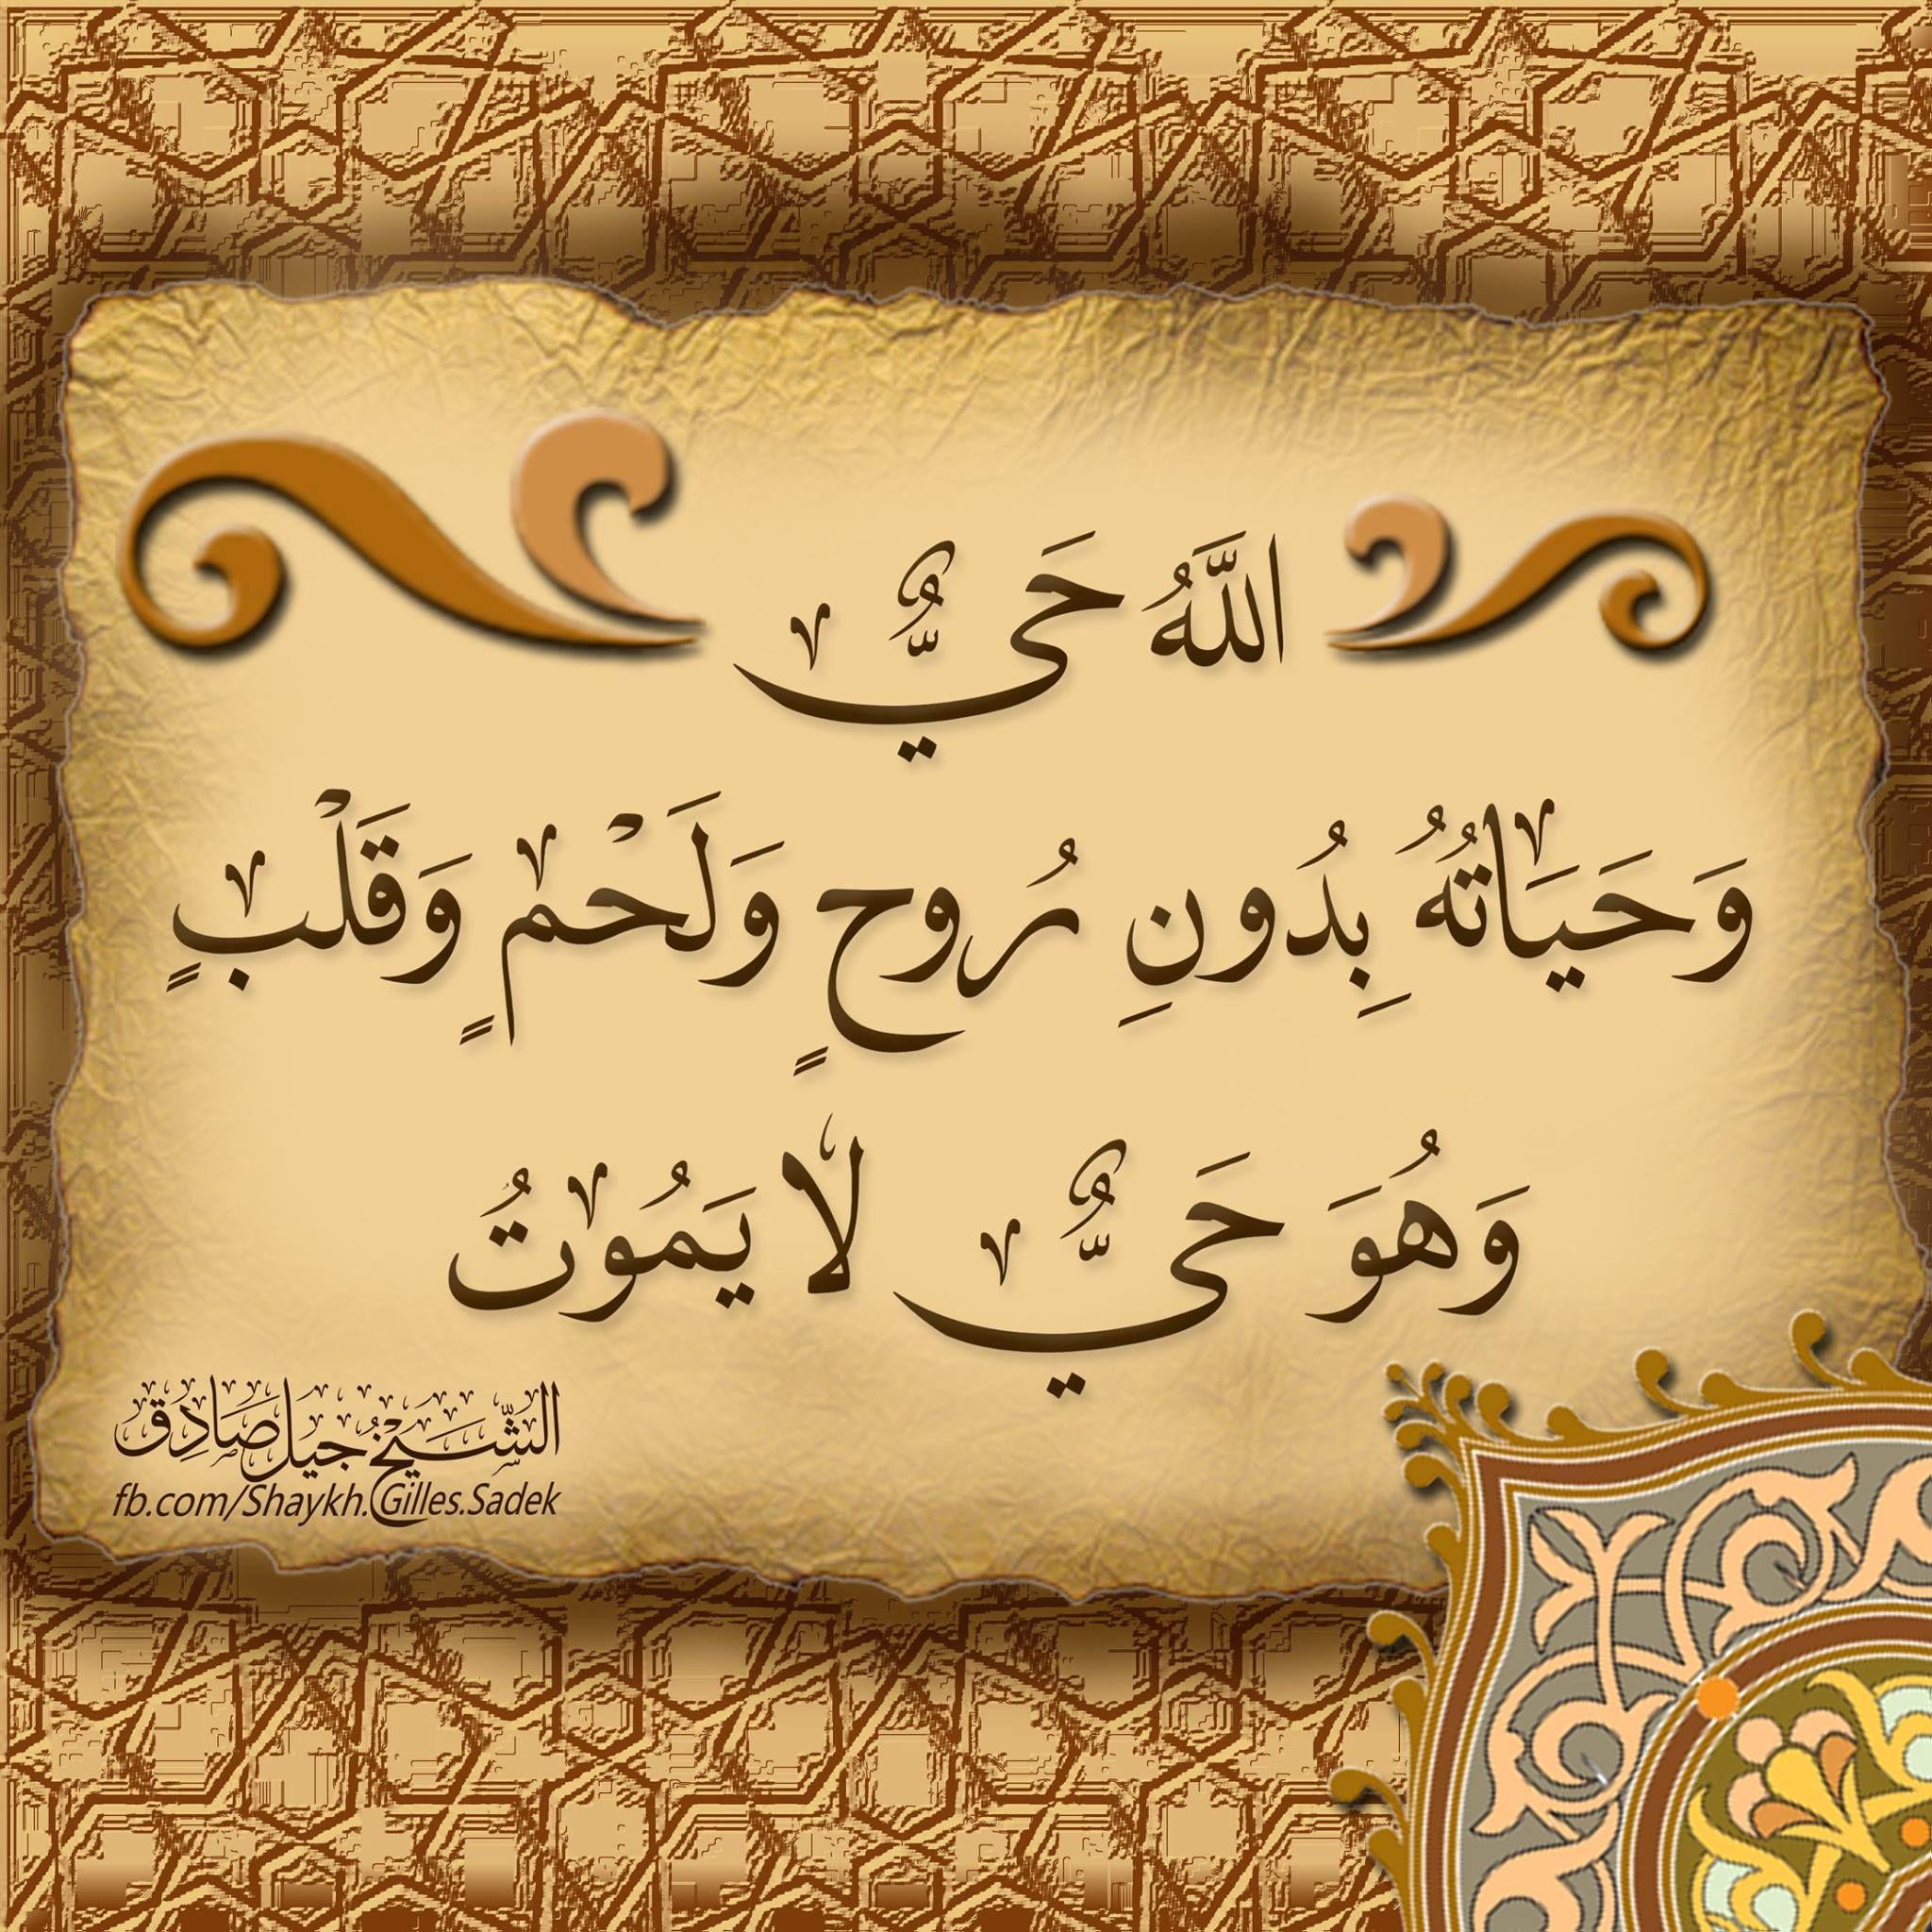 Fb Com Shaykh Gilles Sadek Whatsapp 15148244550 Twitter Shaykhgilles Instagram Shaykhgilles Telegram Shaykh Gilles Sadek Http With Images Islamic Art Instagram Photo